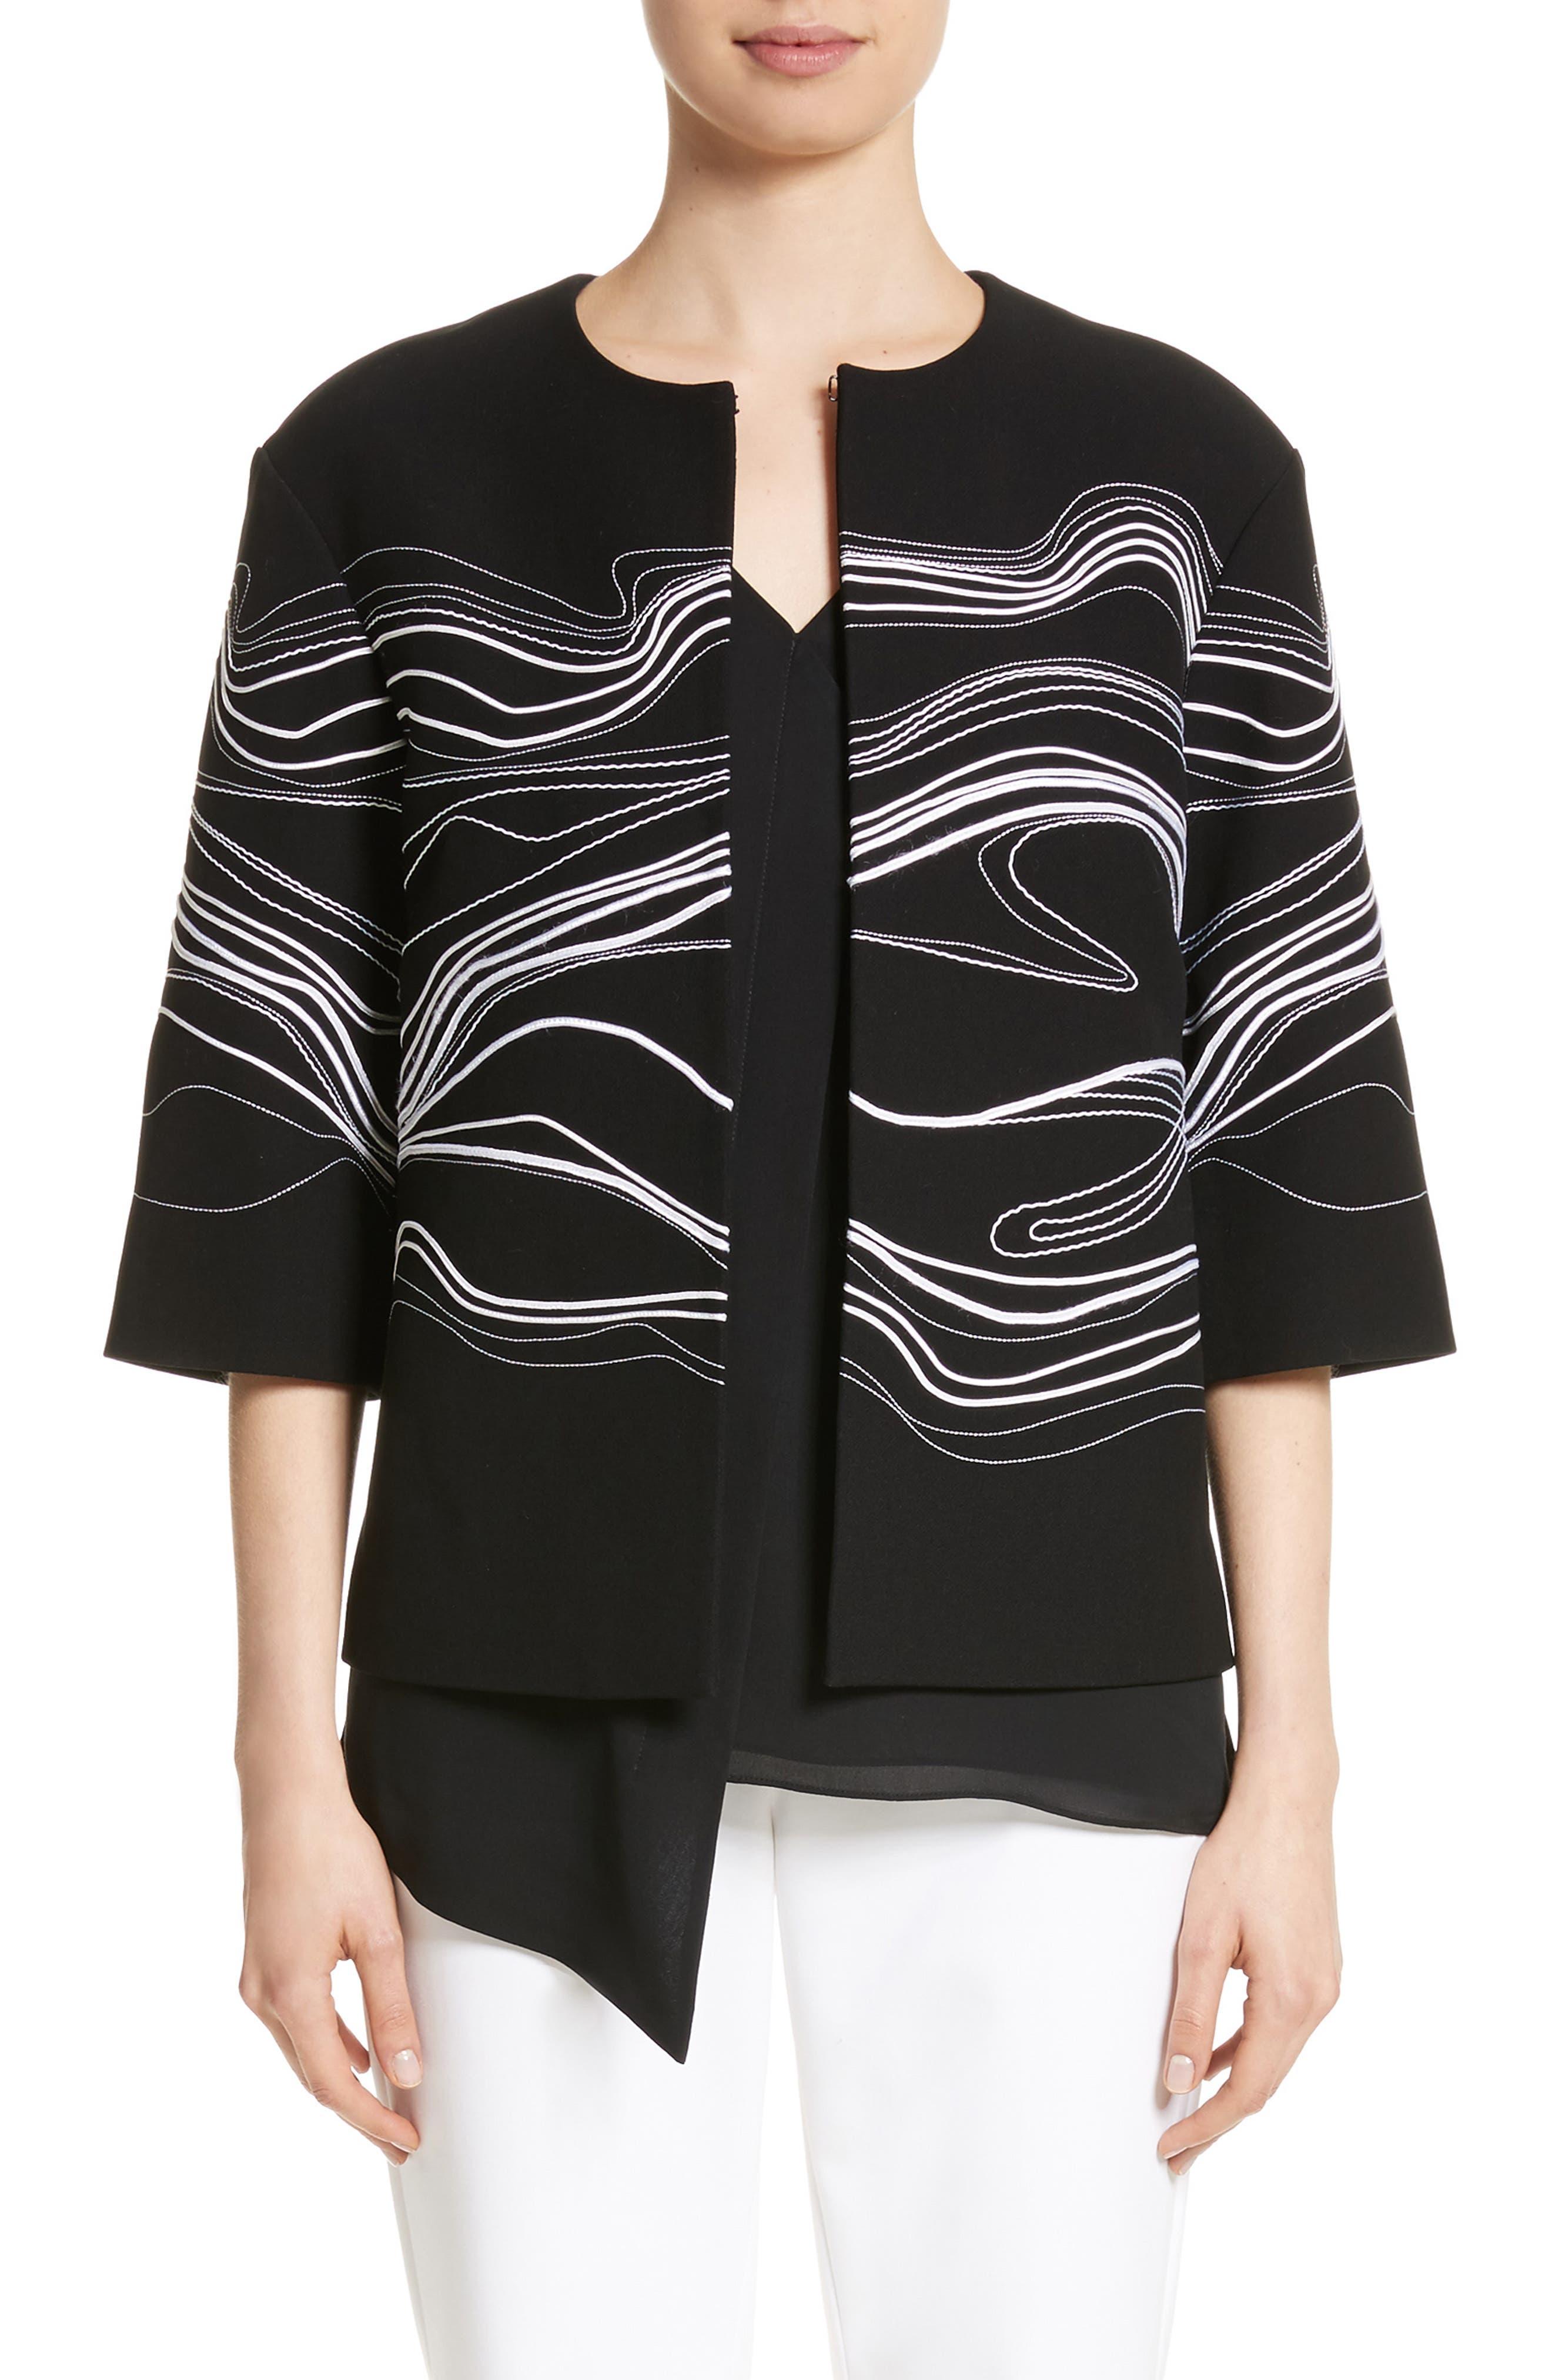 Bella Brushstroke Double Weave Jacket,                             Main thumbnail 1, color,                             Caviar/ Bianco